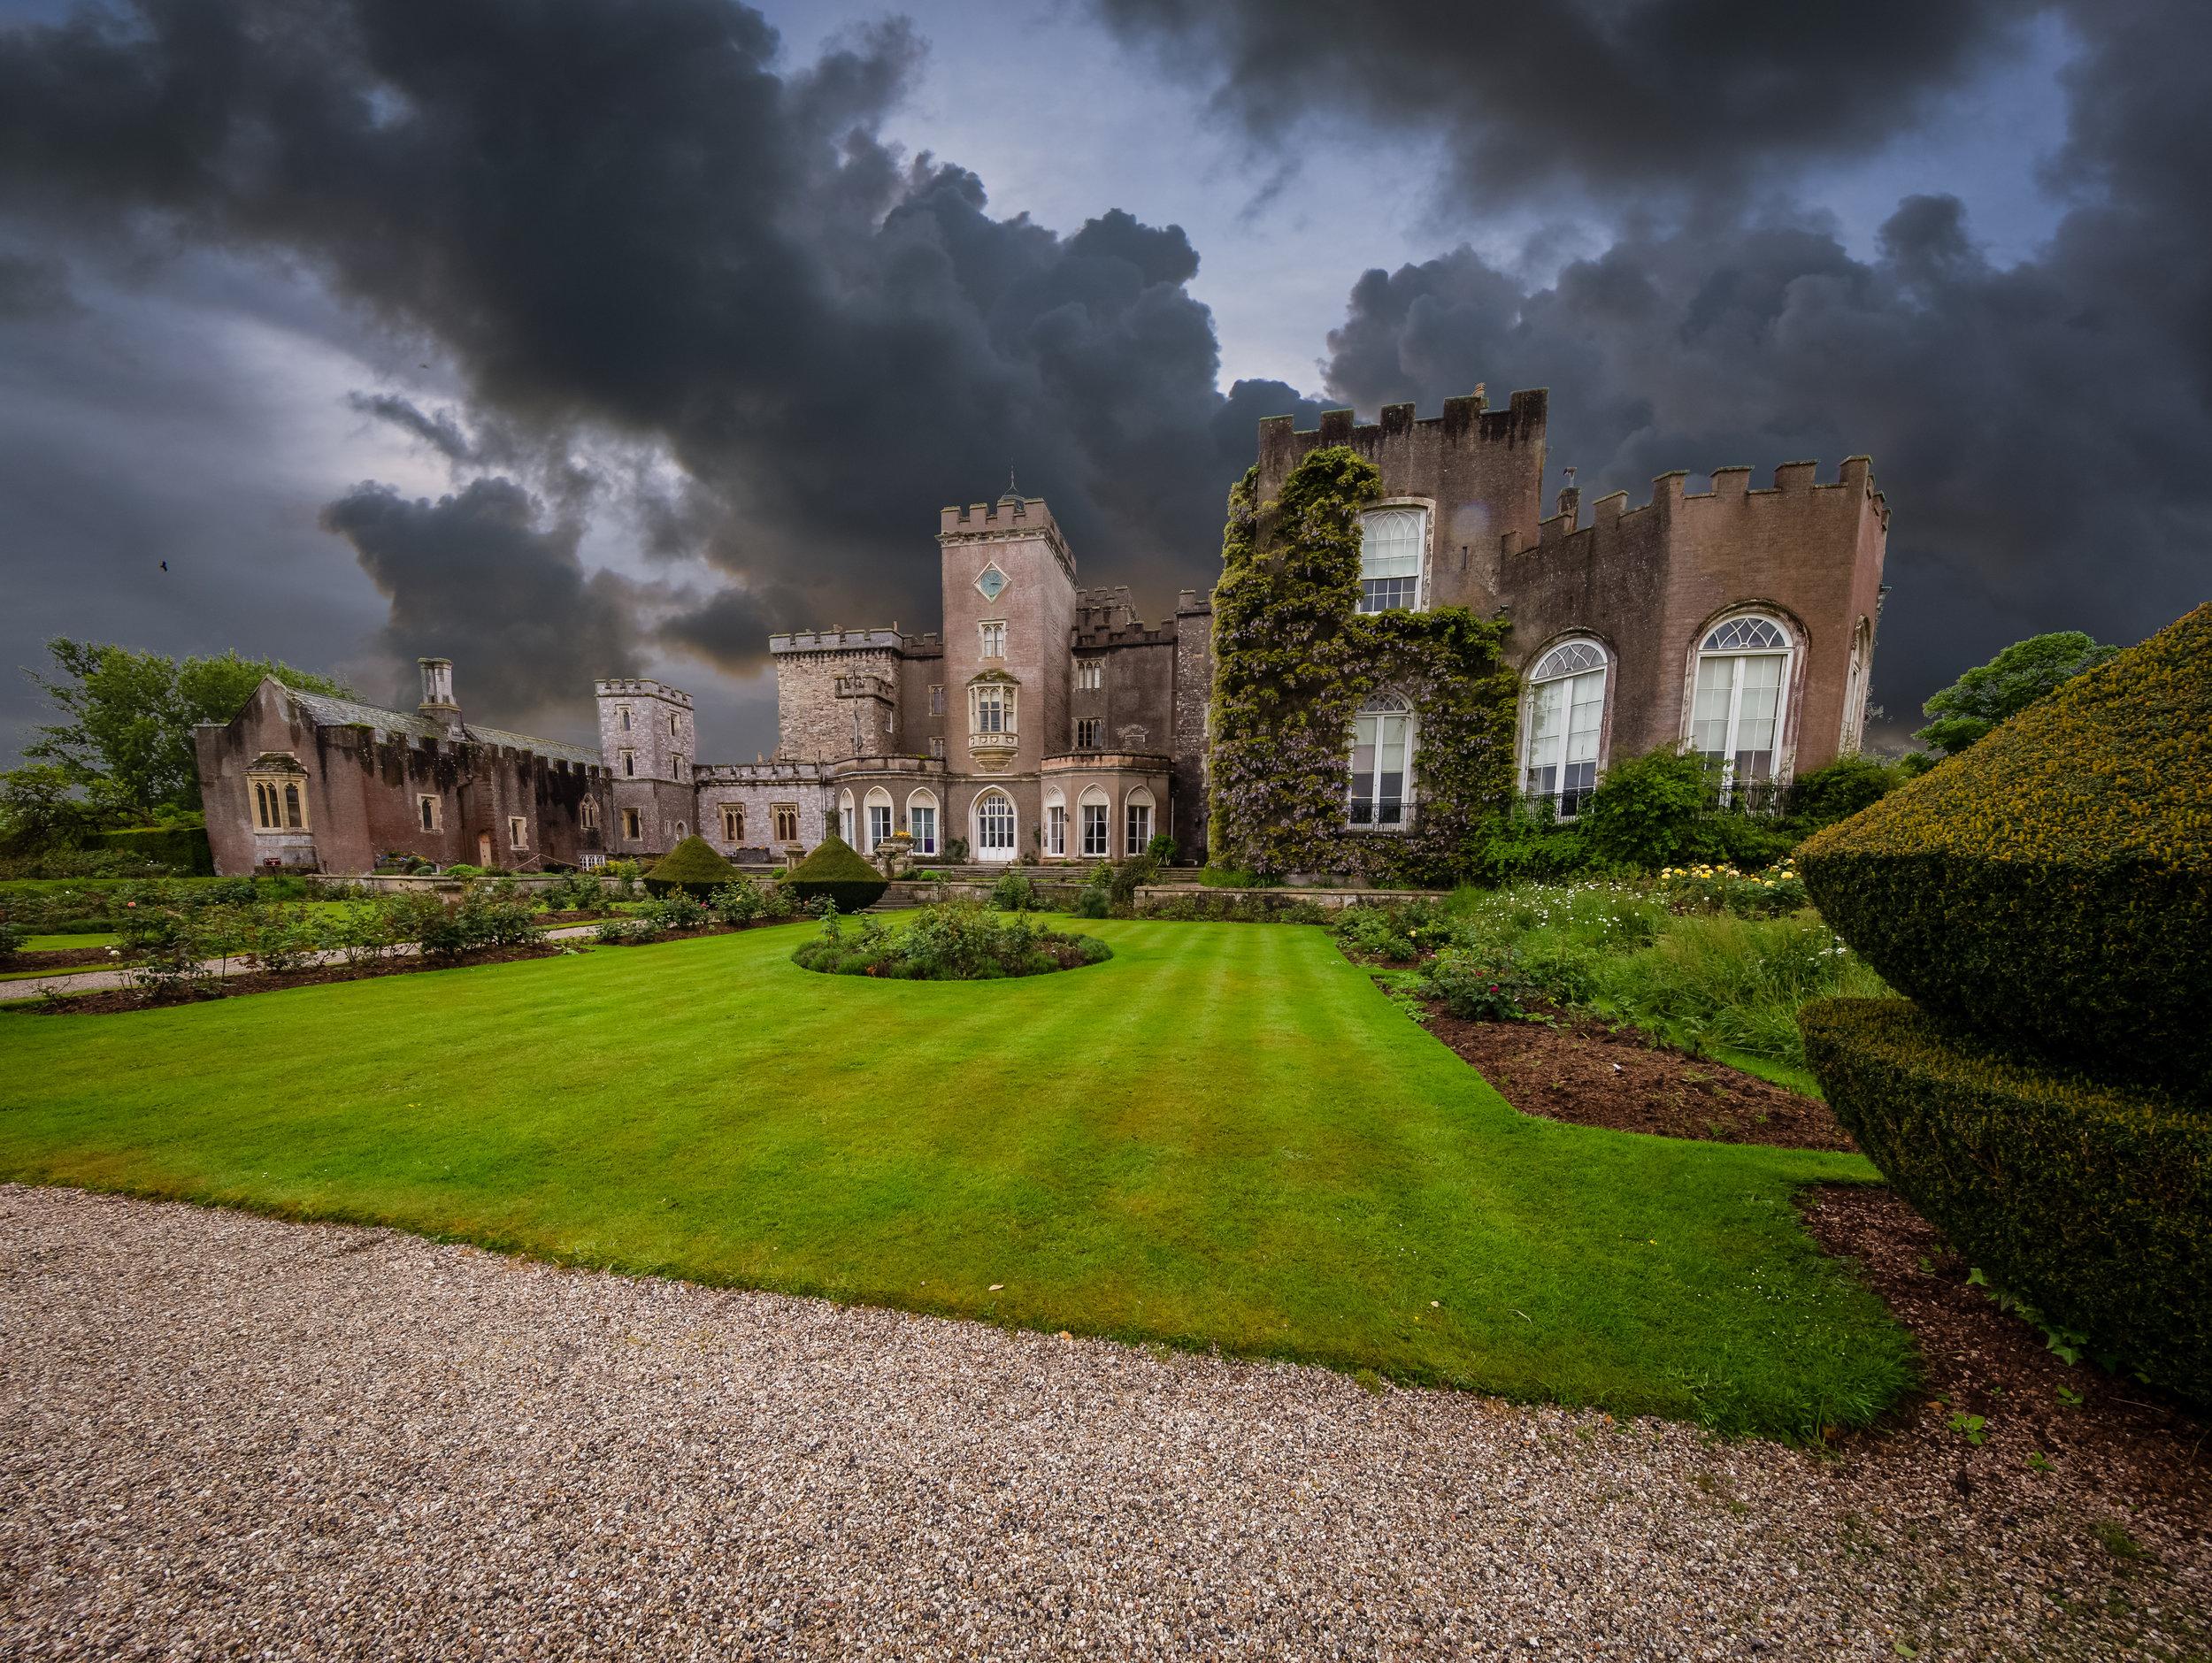 powderham castle ©jennifer bailey 2017